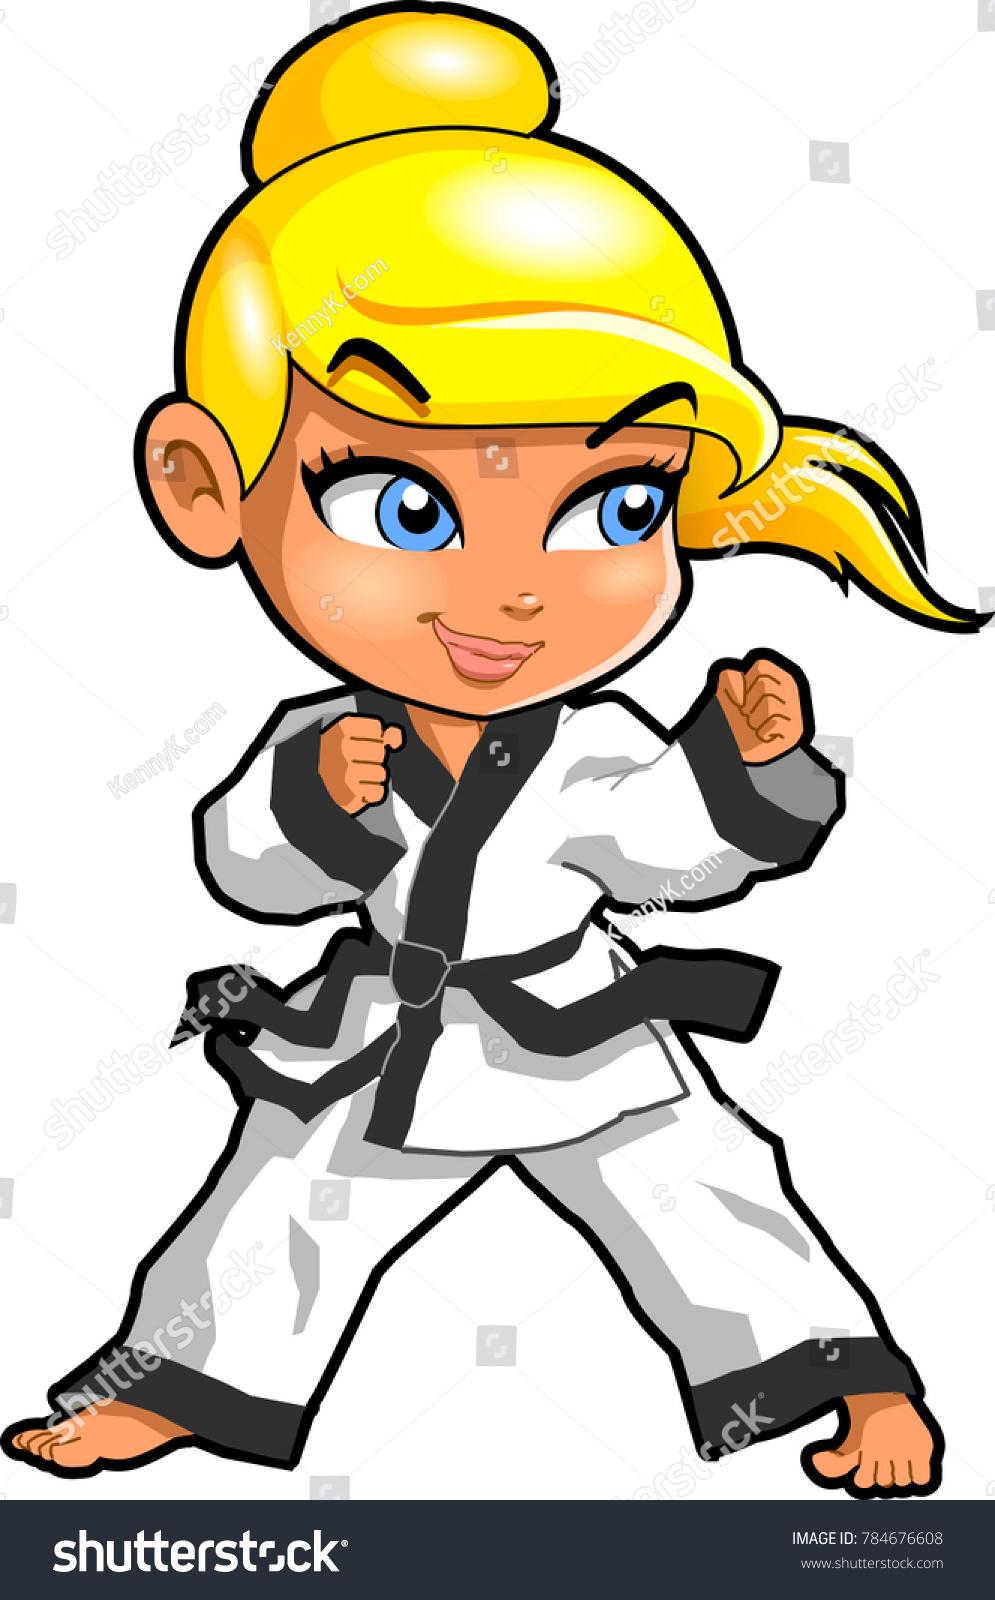 Karate Martial Arts Tae Kwon Do Stock Vector Royalty Free 784676608